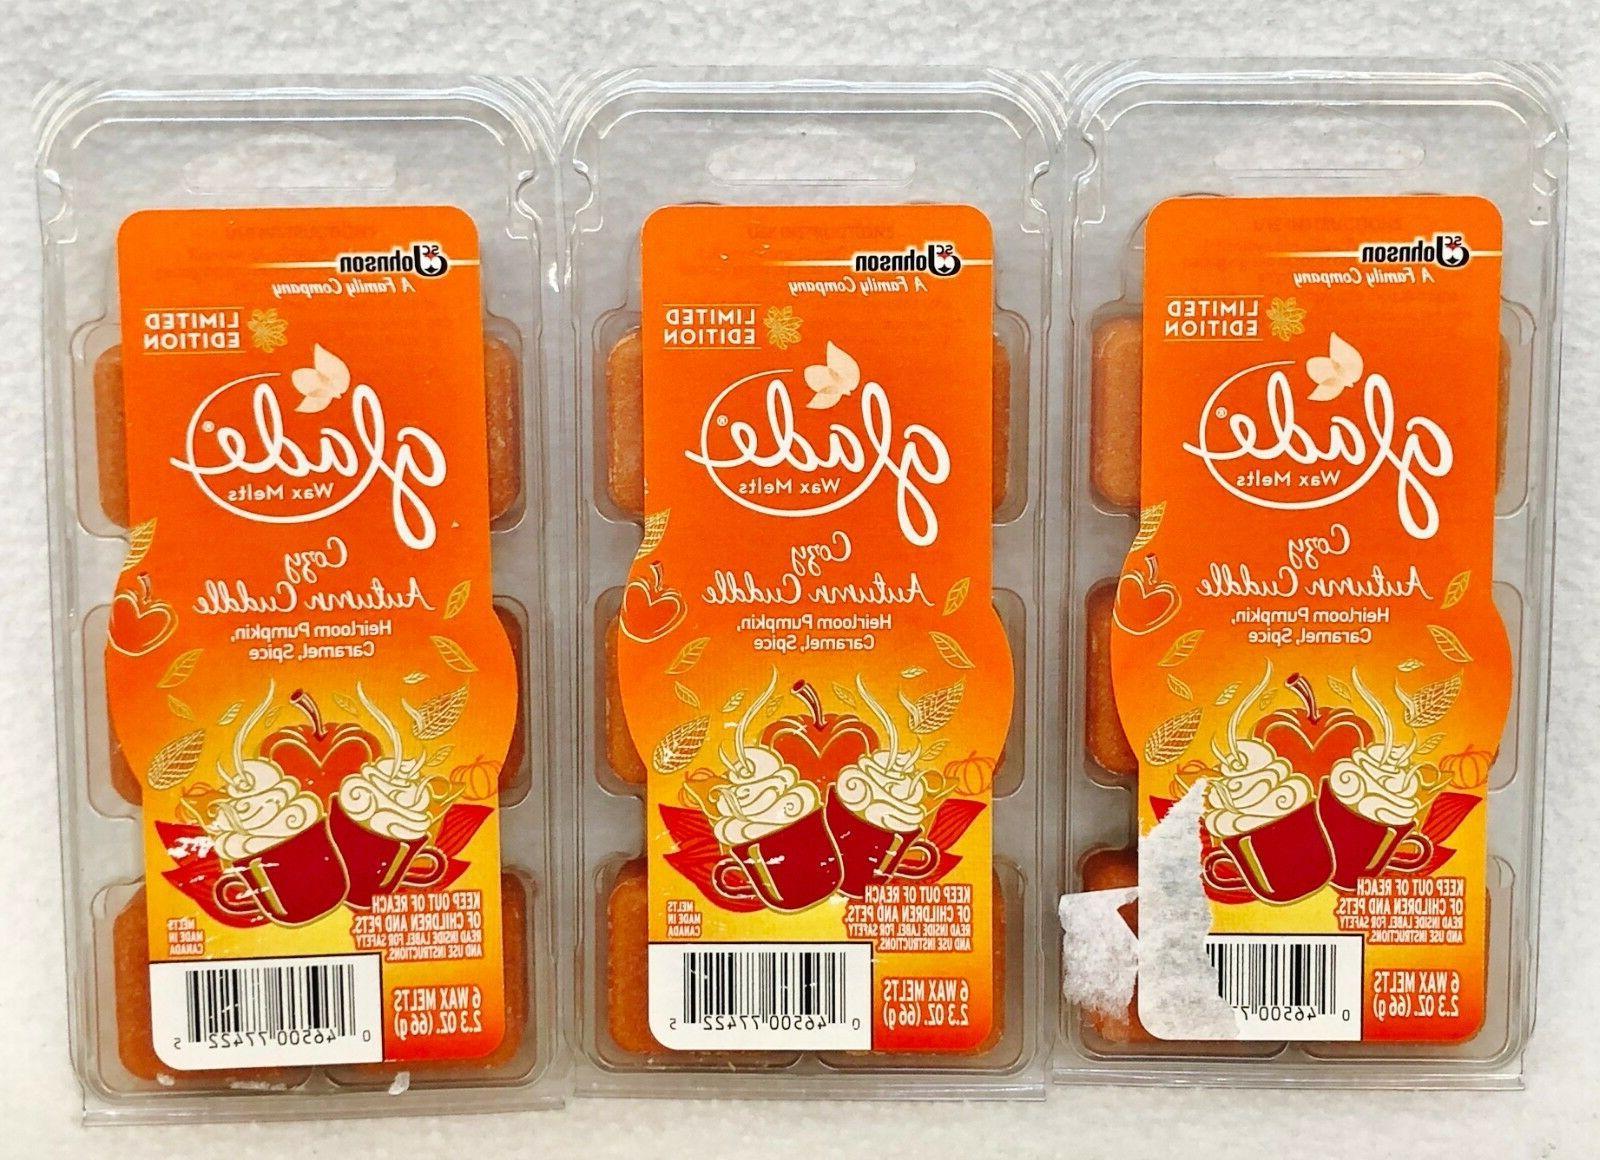 3 PACKS Glade COZY AUTUMN CUDDLE Pumpkin Caramel Spice Wax M